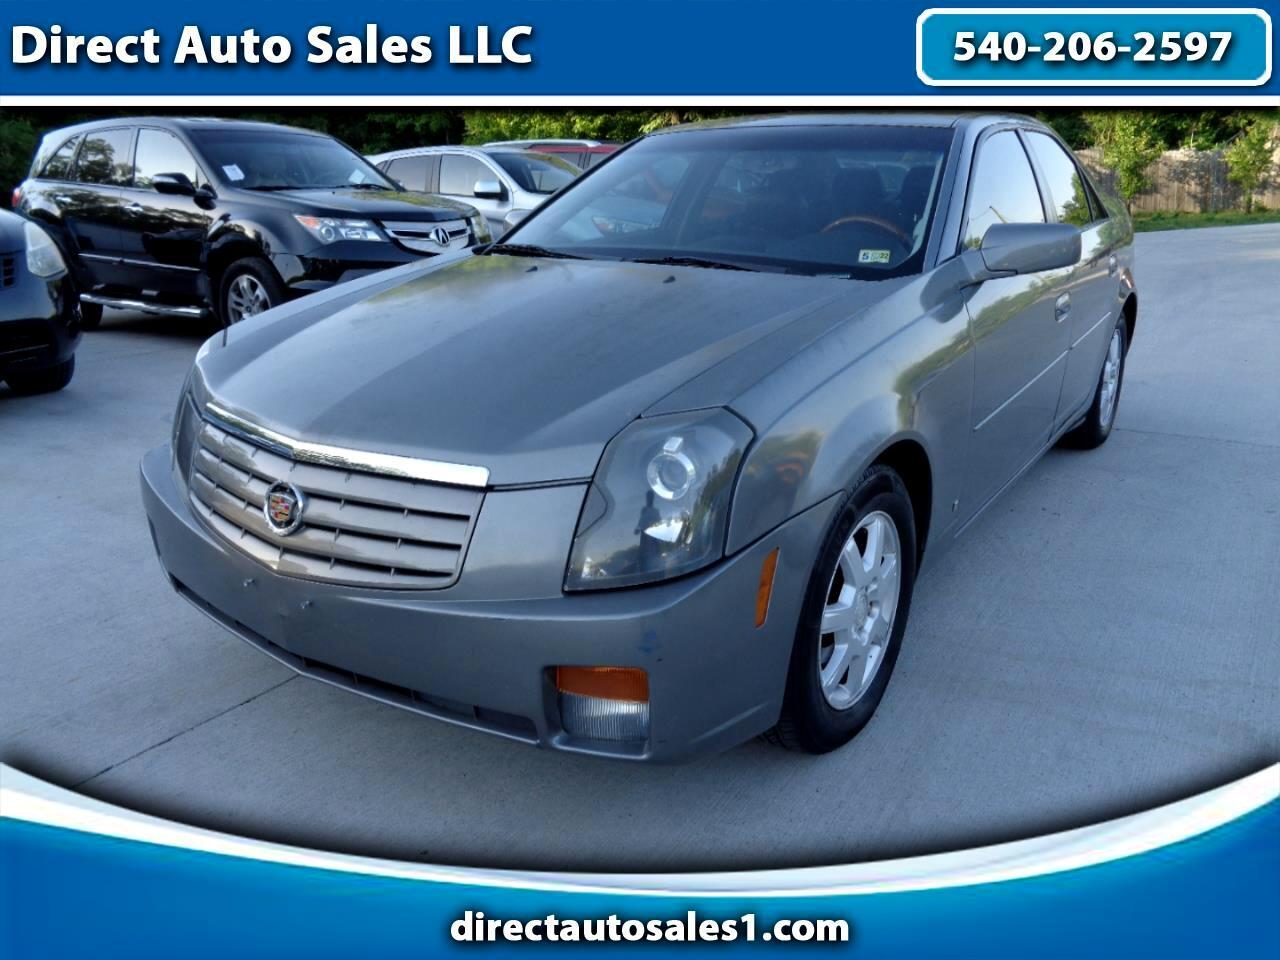 Cadillac CTS 4dr Sdn 3.6L 2006